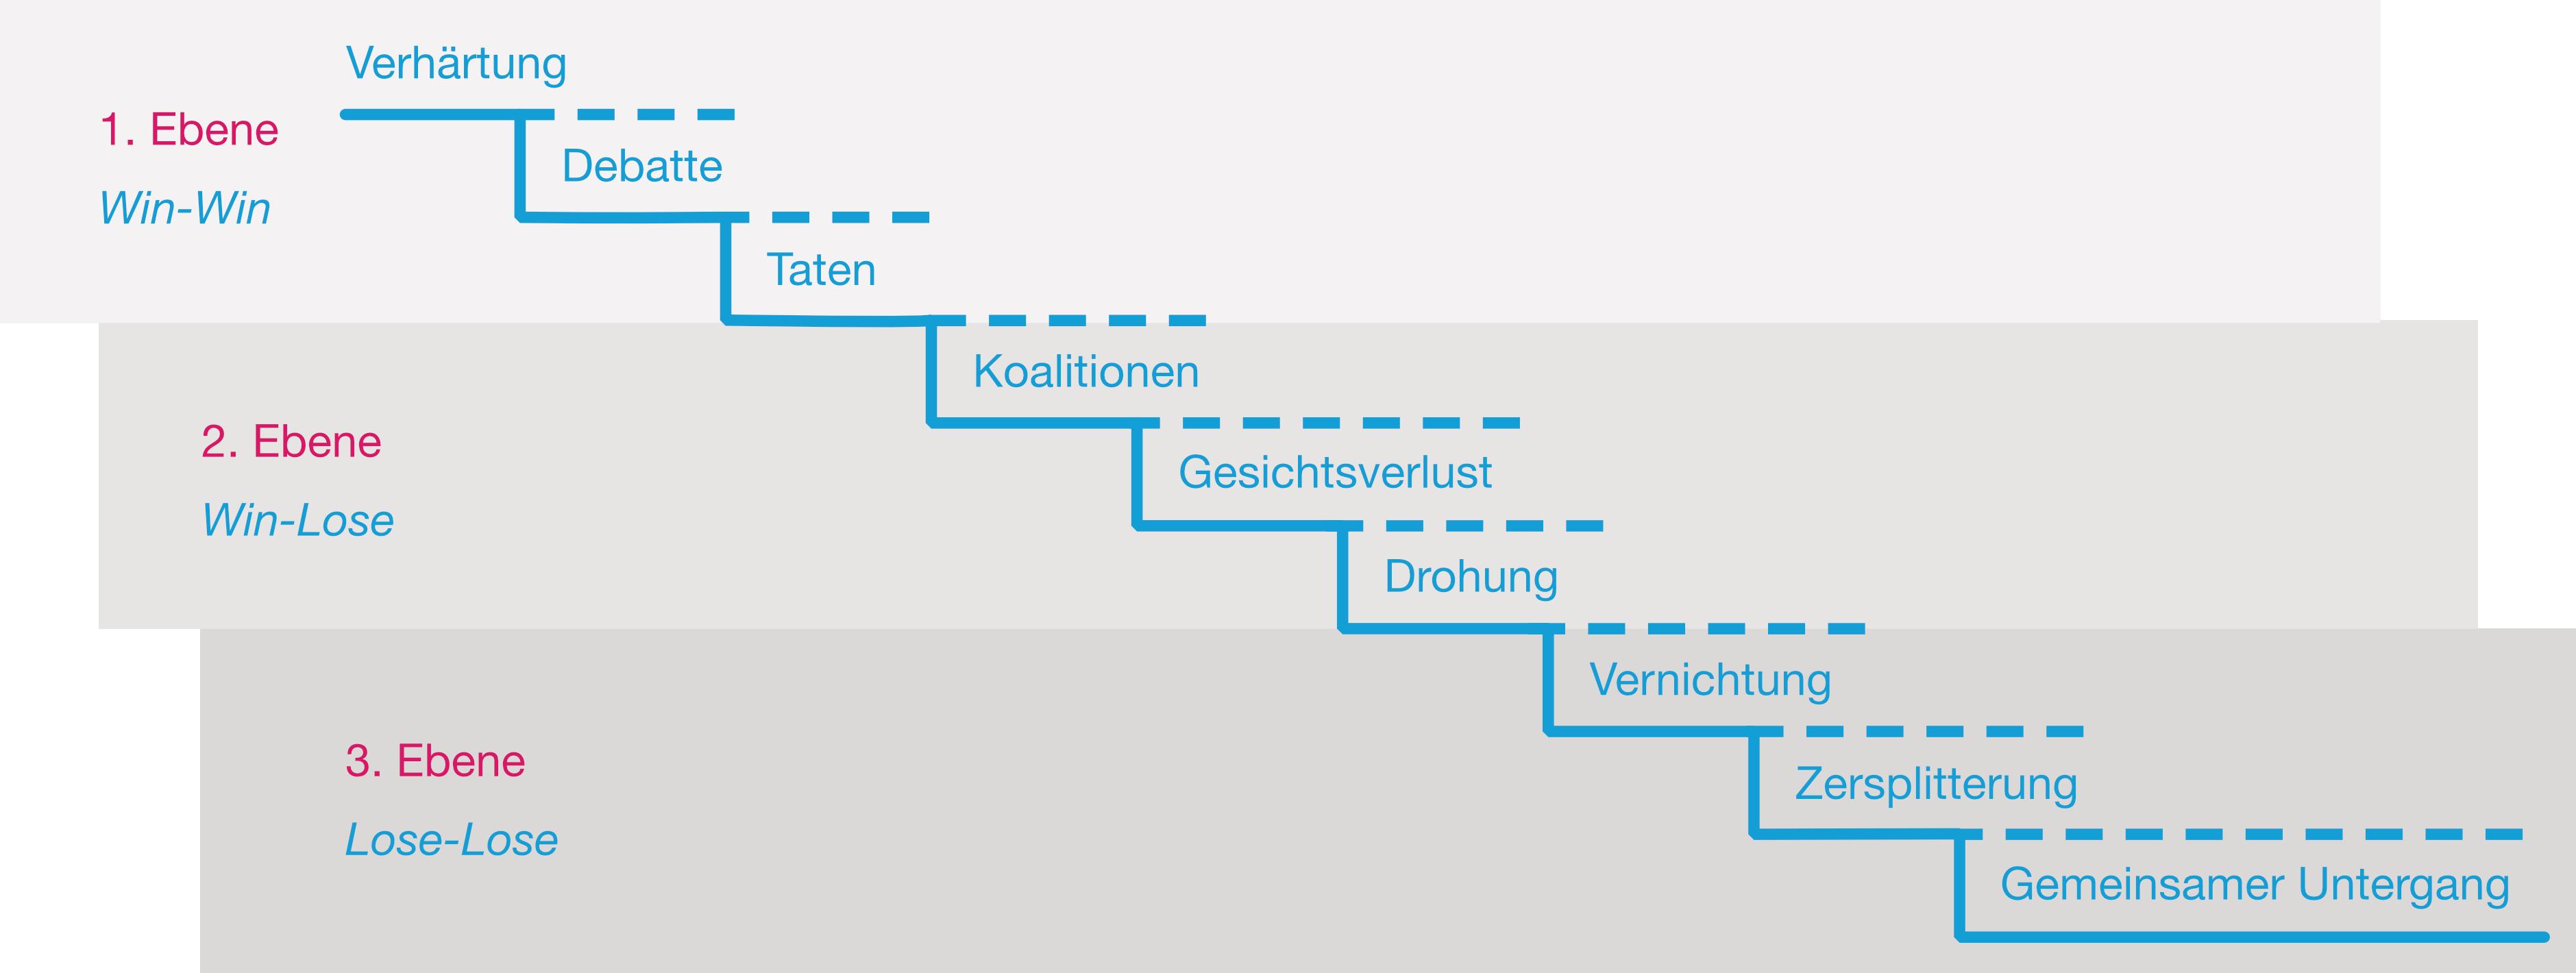 Konflikteskalation in 9 Stufen nach Friedrich Glasl.